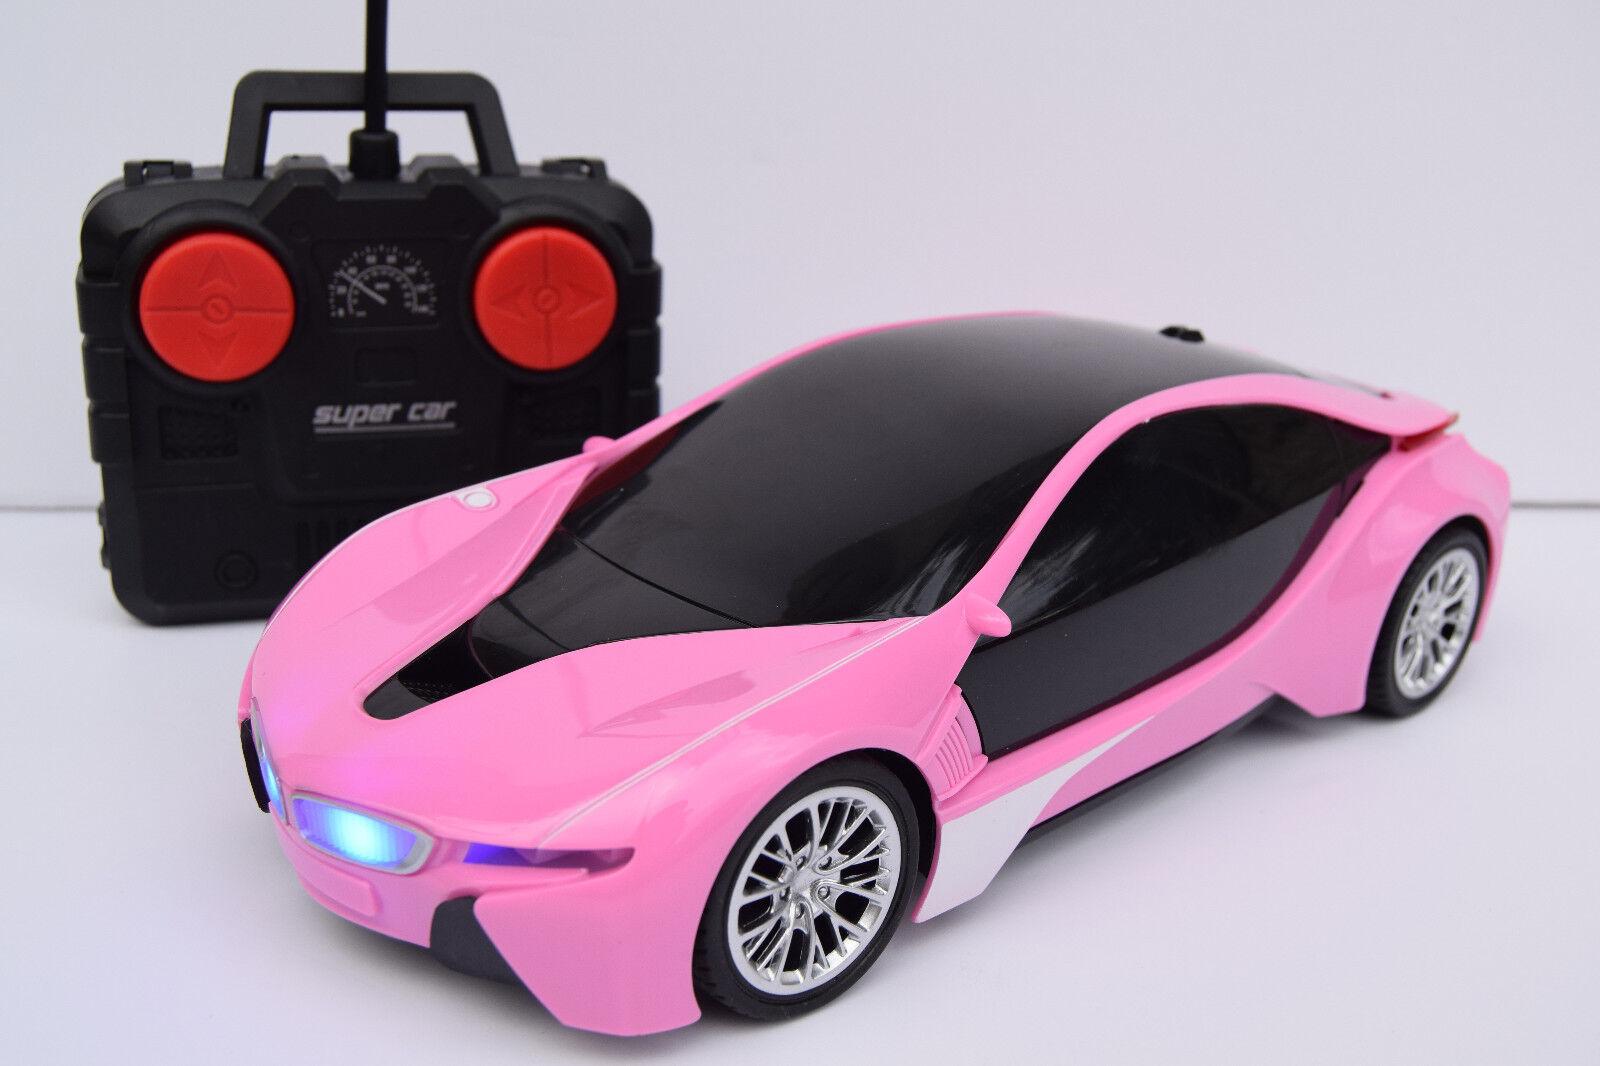 JEFFREE PINK BMW i8 RADIO REMOTE CONTROL CAR GIRLS SPORTS CAR 1 16 LIGHTS